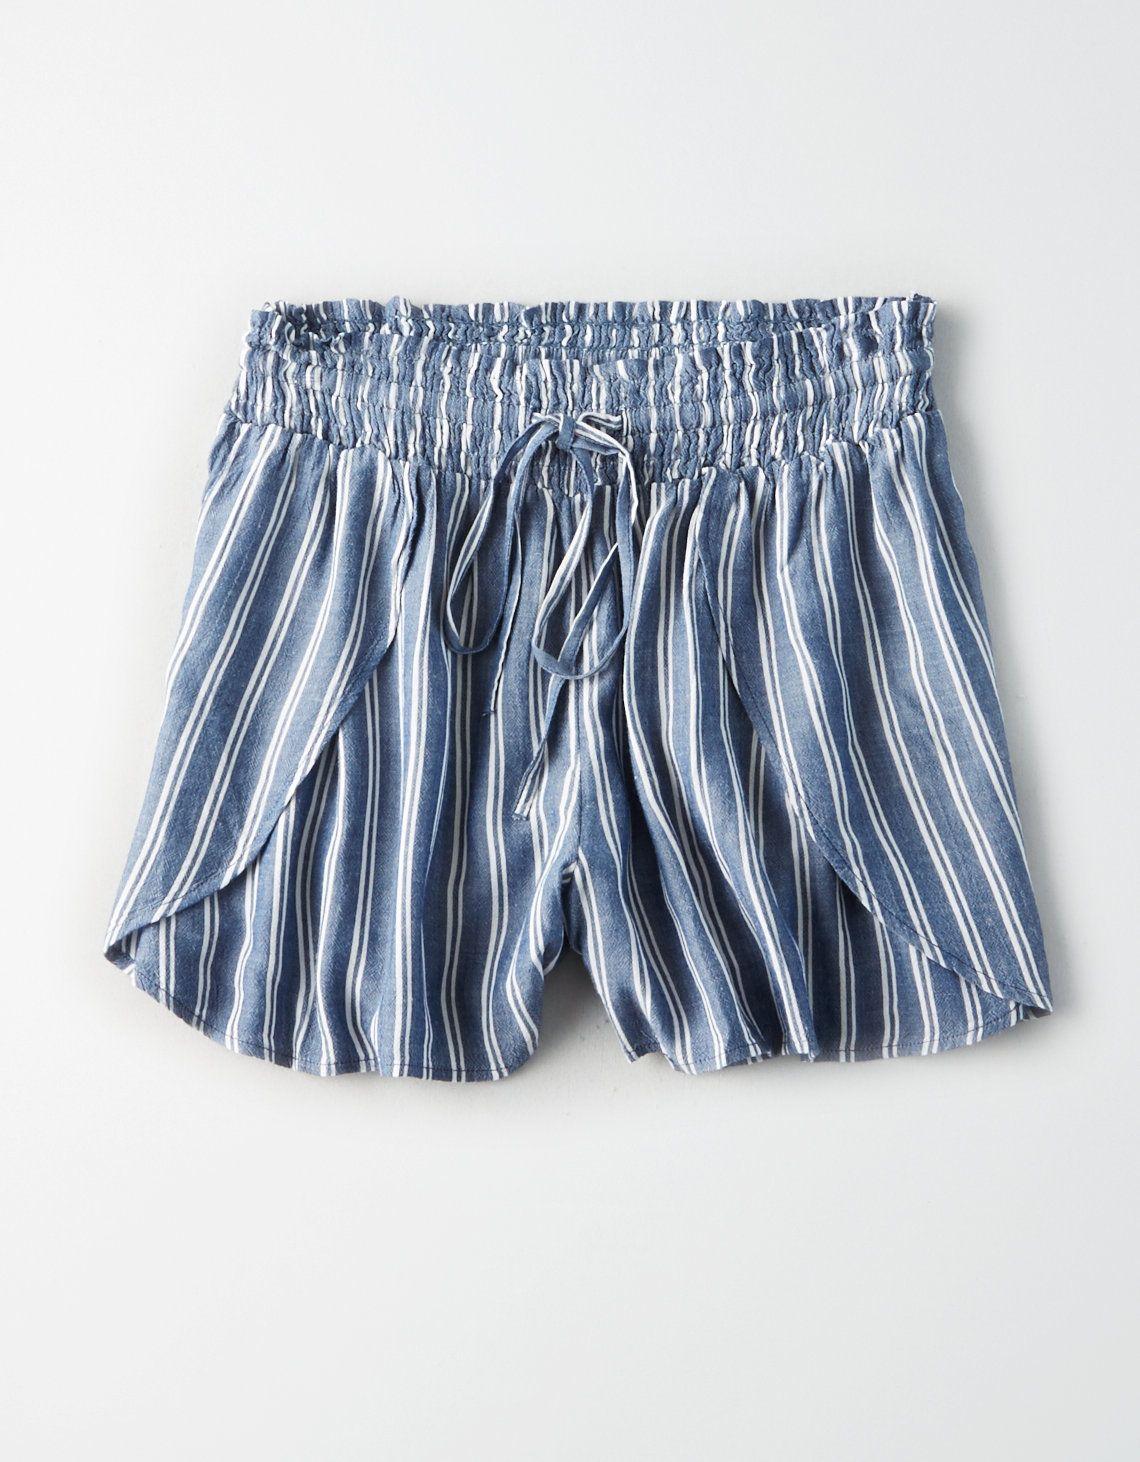 6ac45e6e6f AE Plaid Paperbag Short in 2019 | New Arrivals | Soft shorts ...